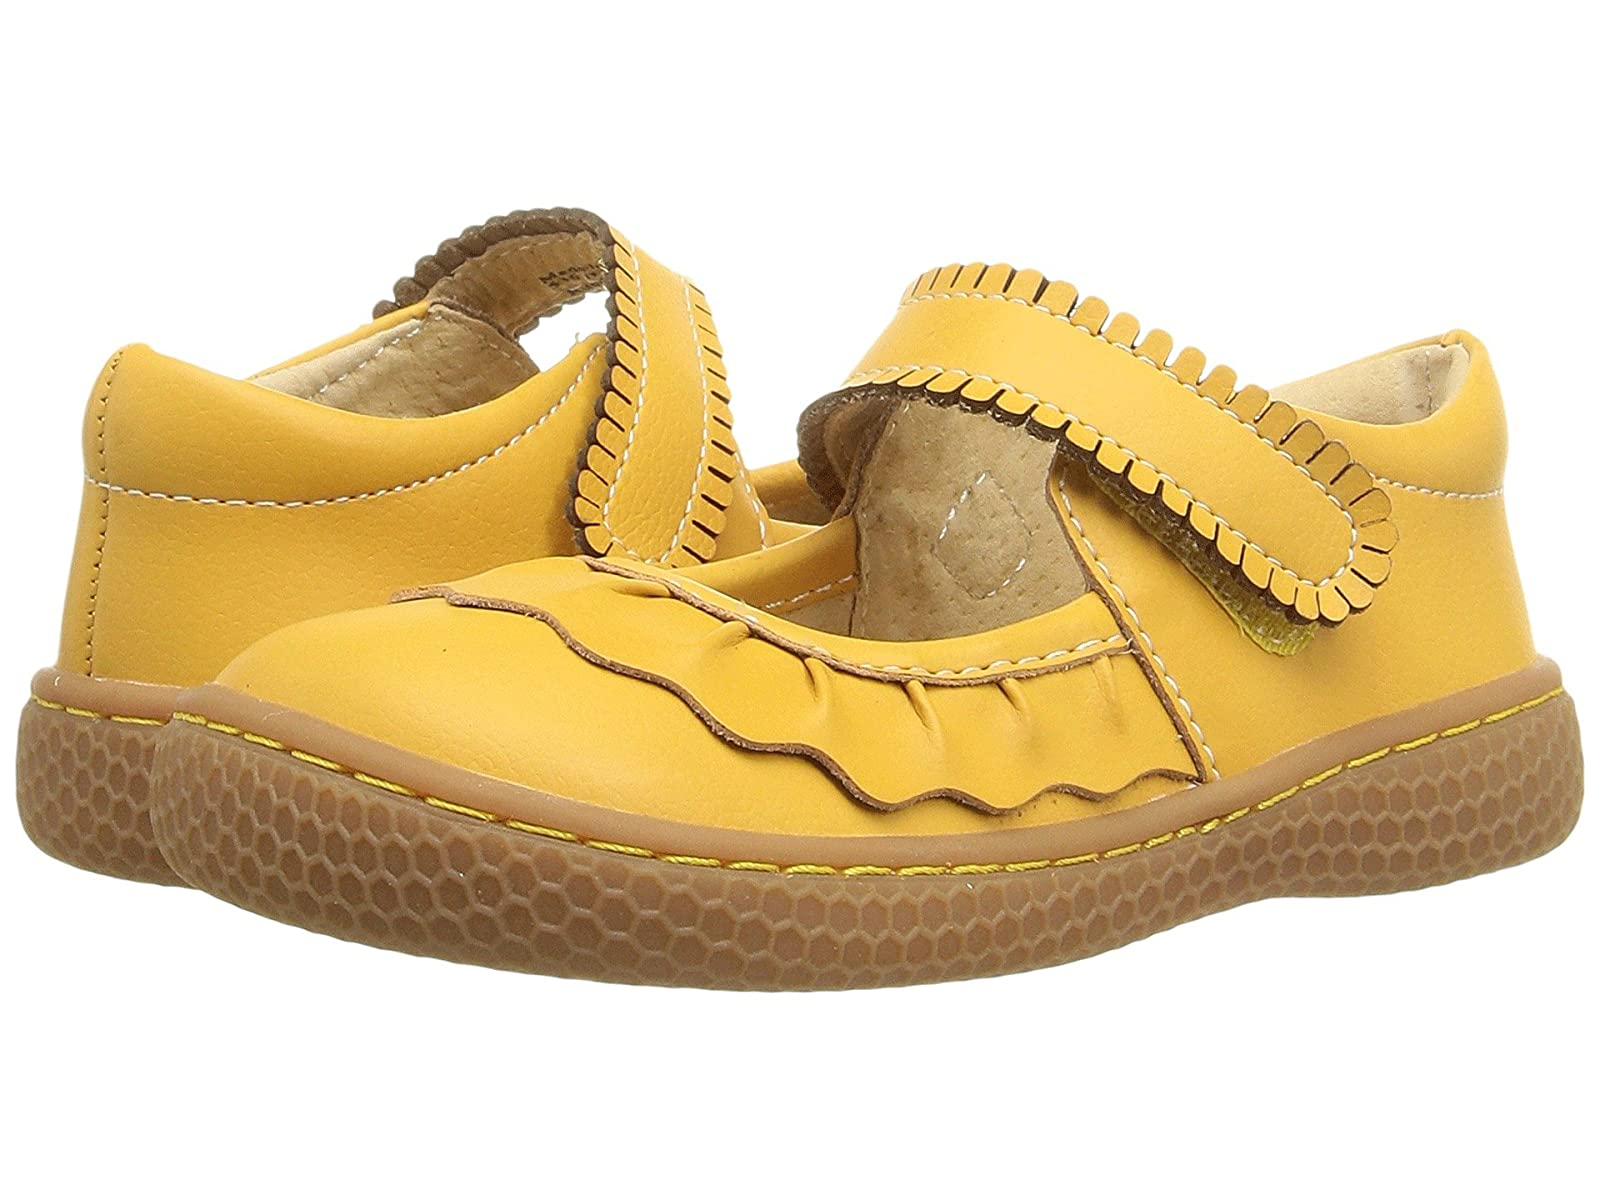 Livie & Luca Ruche (Infant/Toddler/Little Kid)Atmospheric grades have affordable shoes